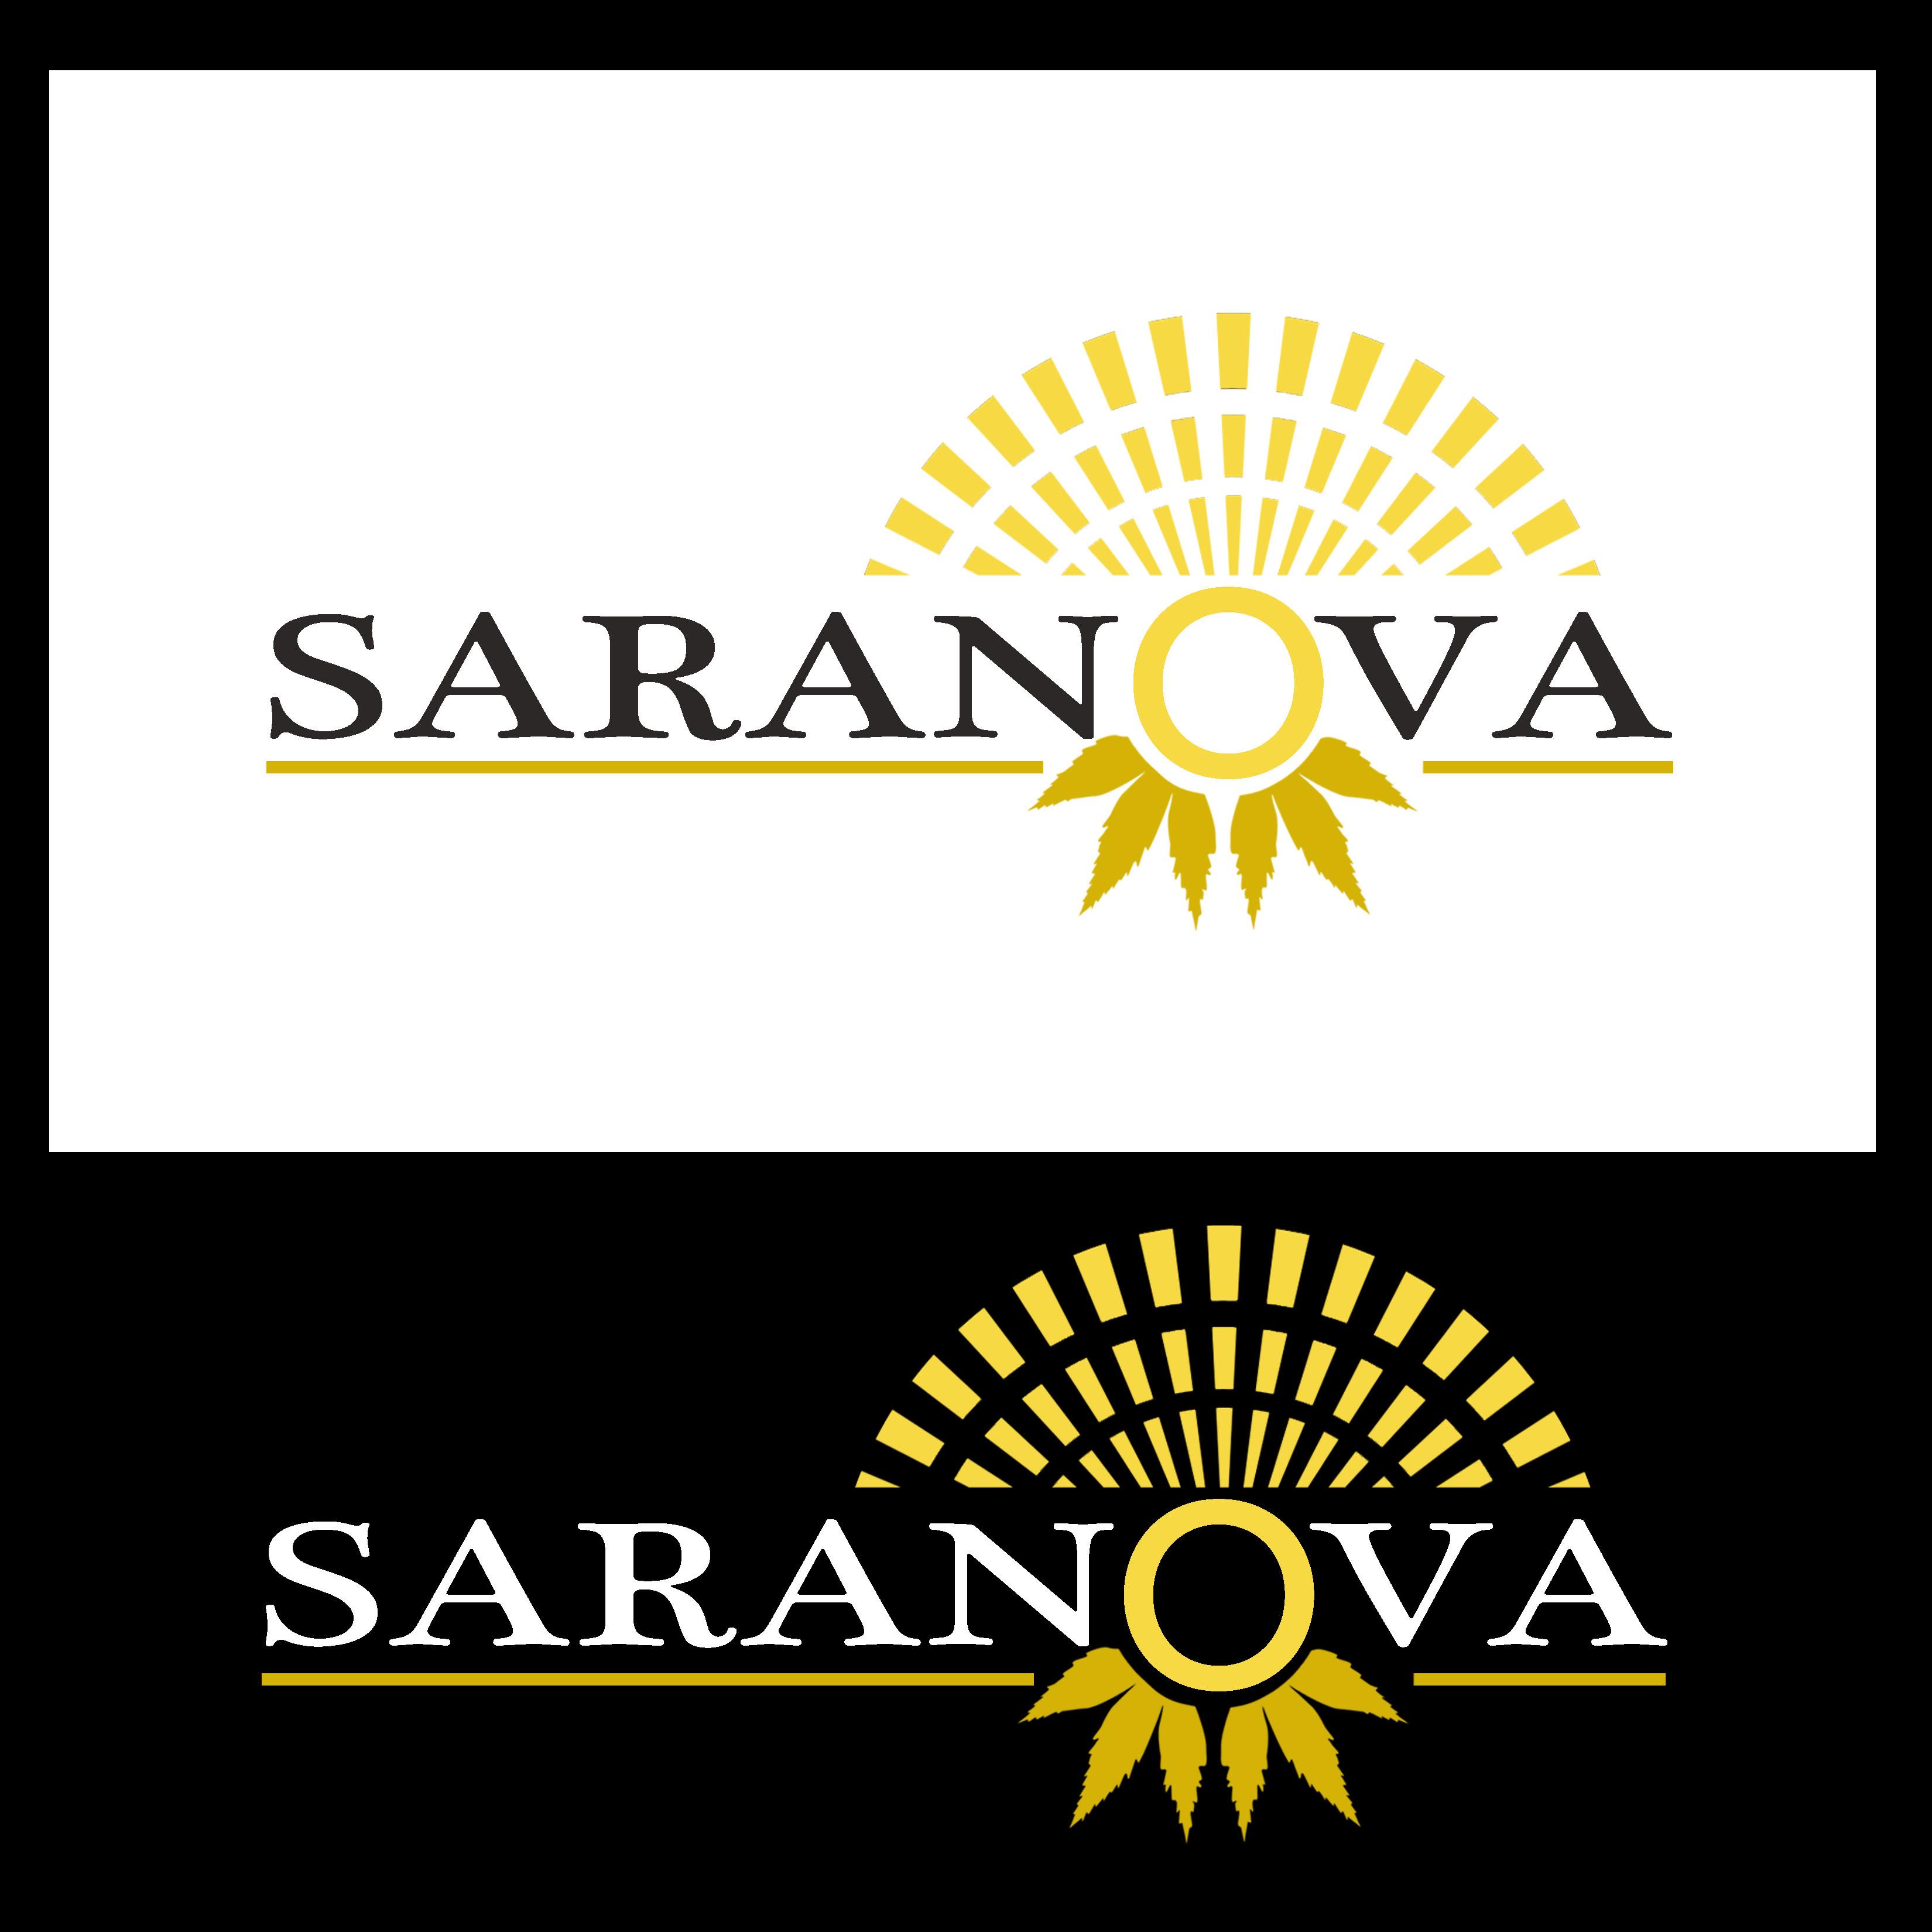 Logo Design by Allan Esclamado - Entry No. 56 in the Logo Design Contest Artistic Logo Design for Saranova.